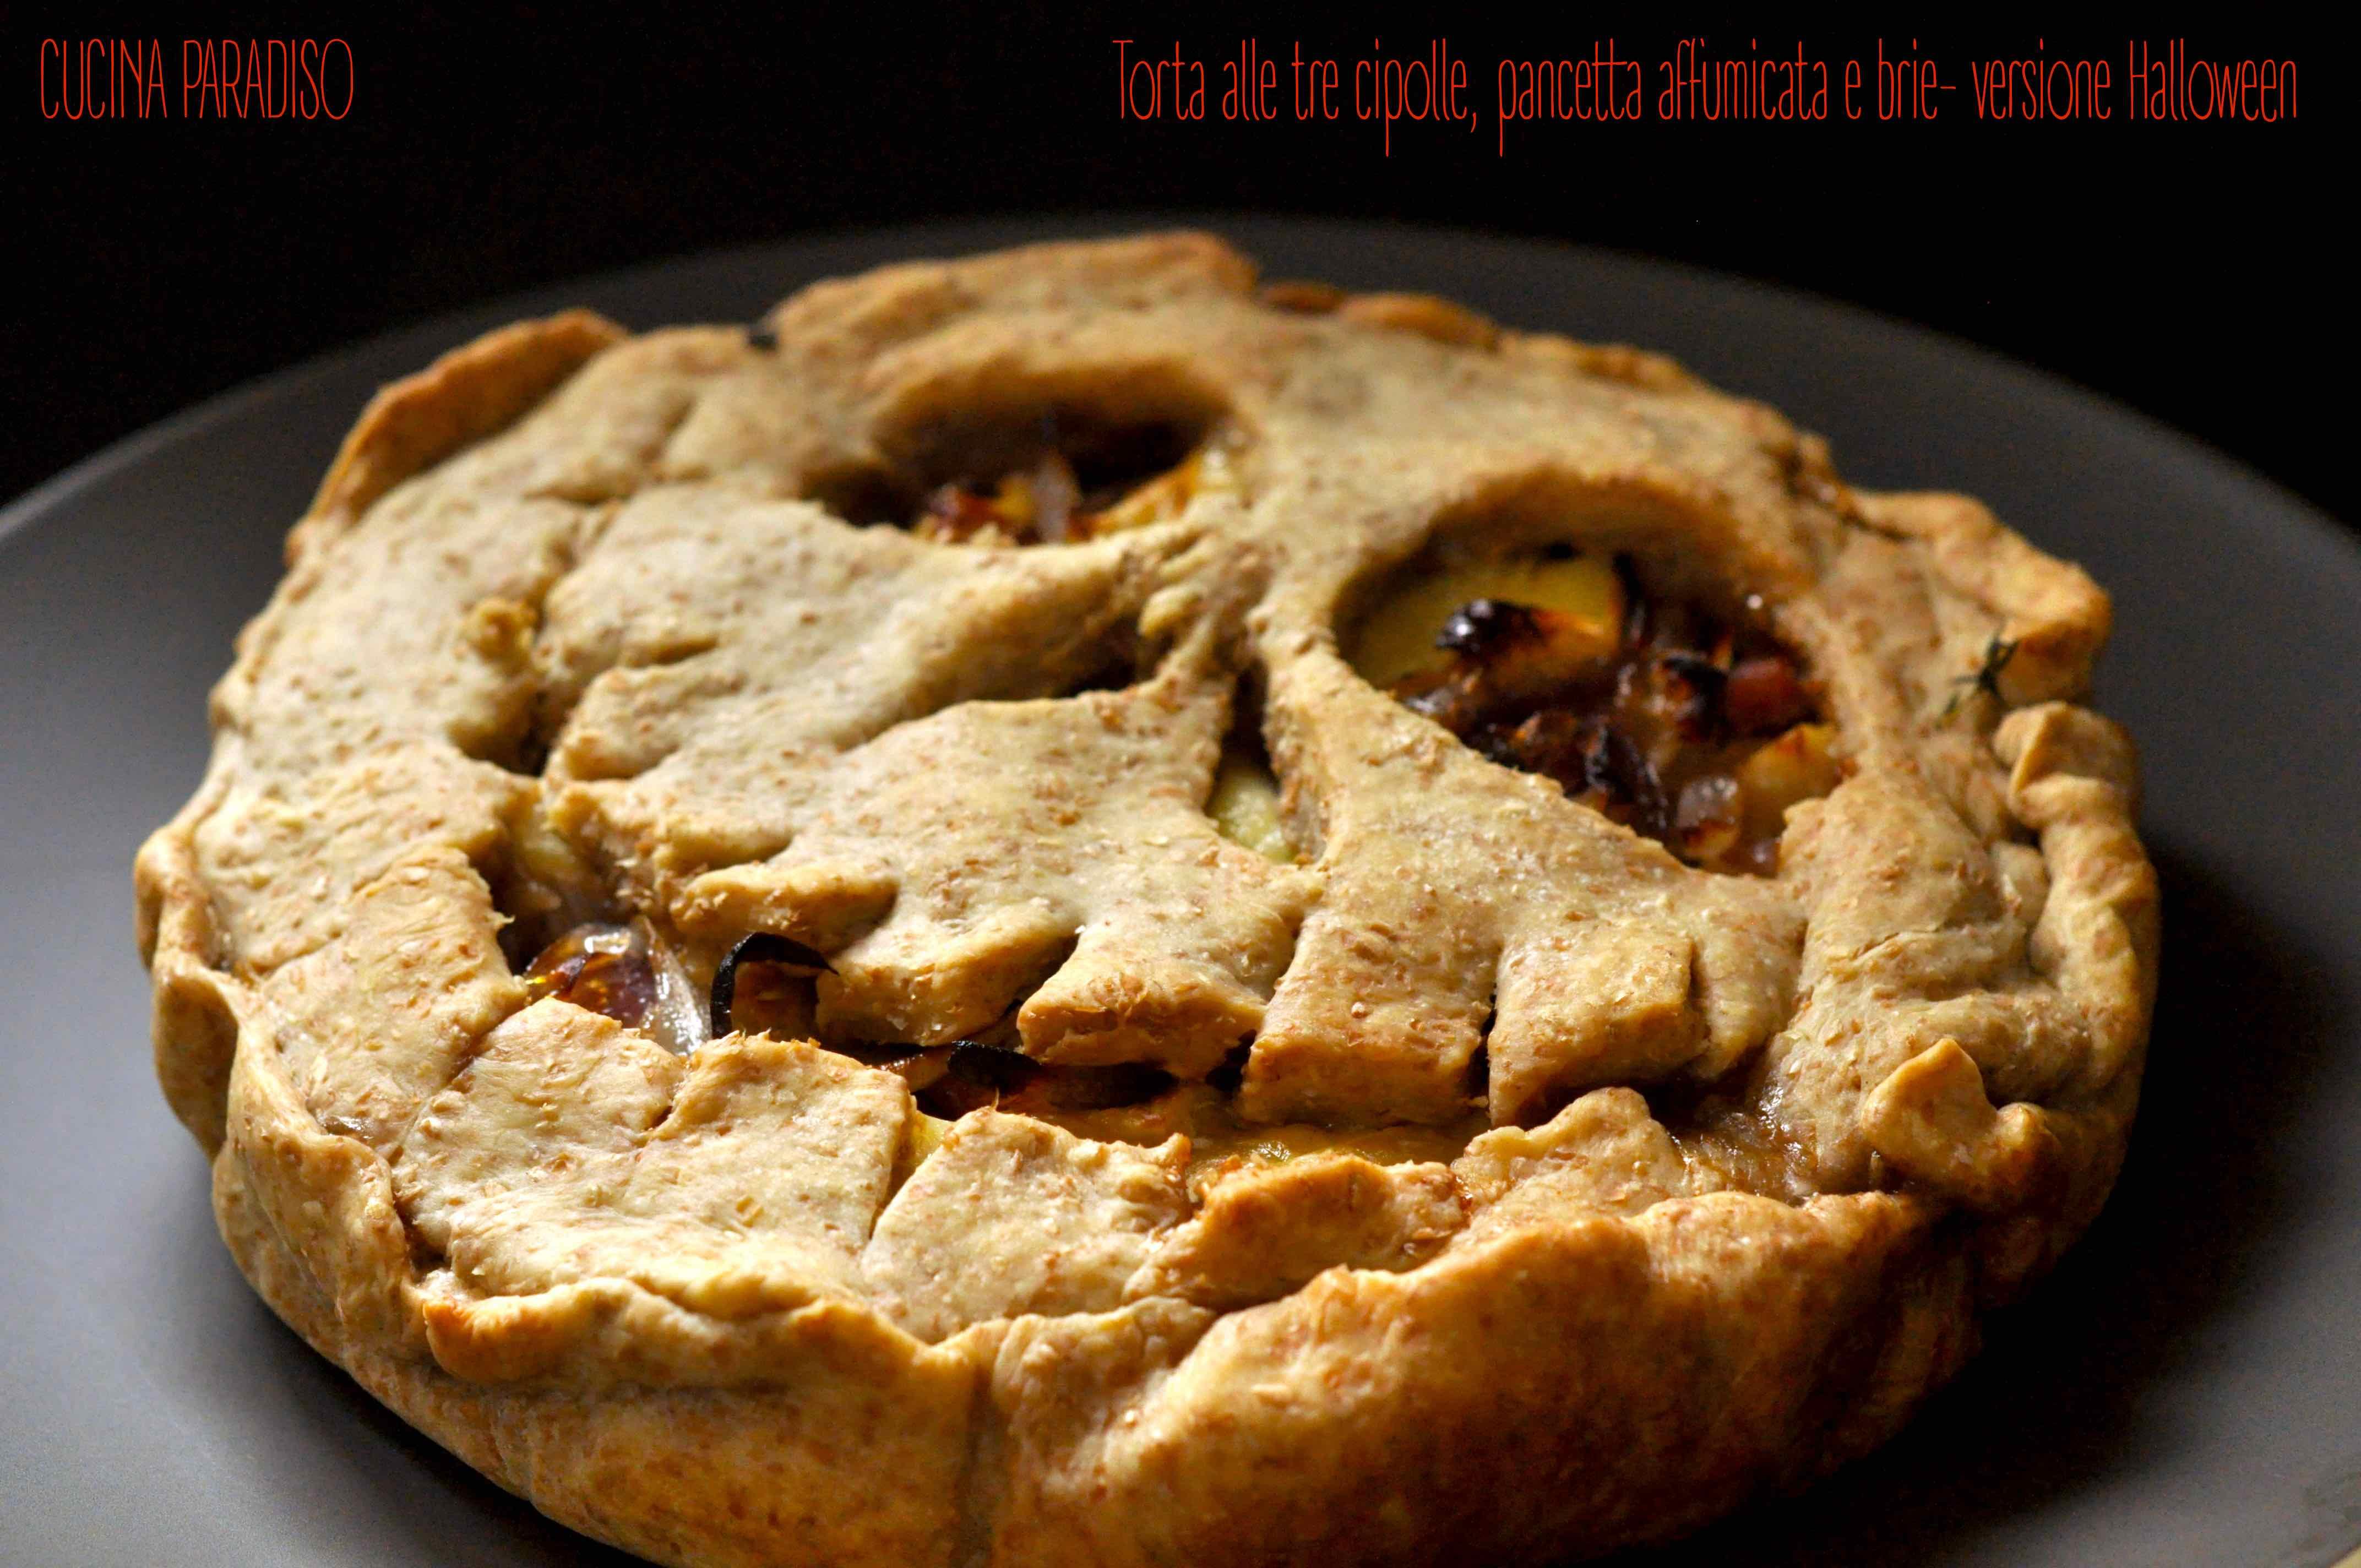 torta-alle-tre-cipolle-pancetta-affumicata-e-brie-versione-halloween